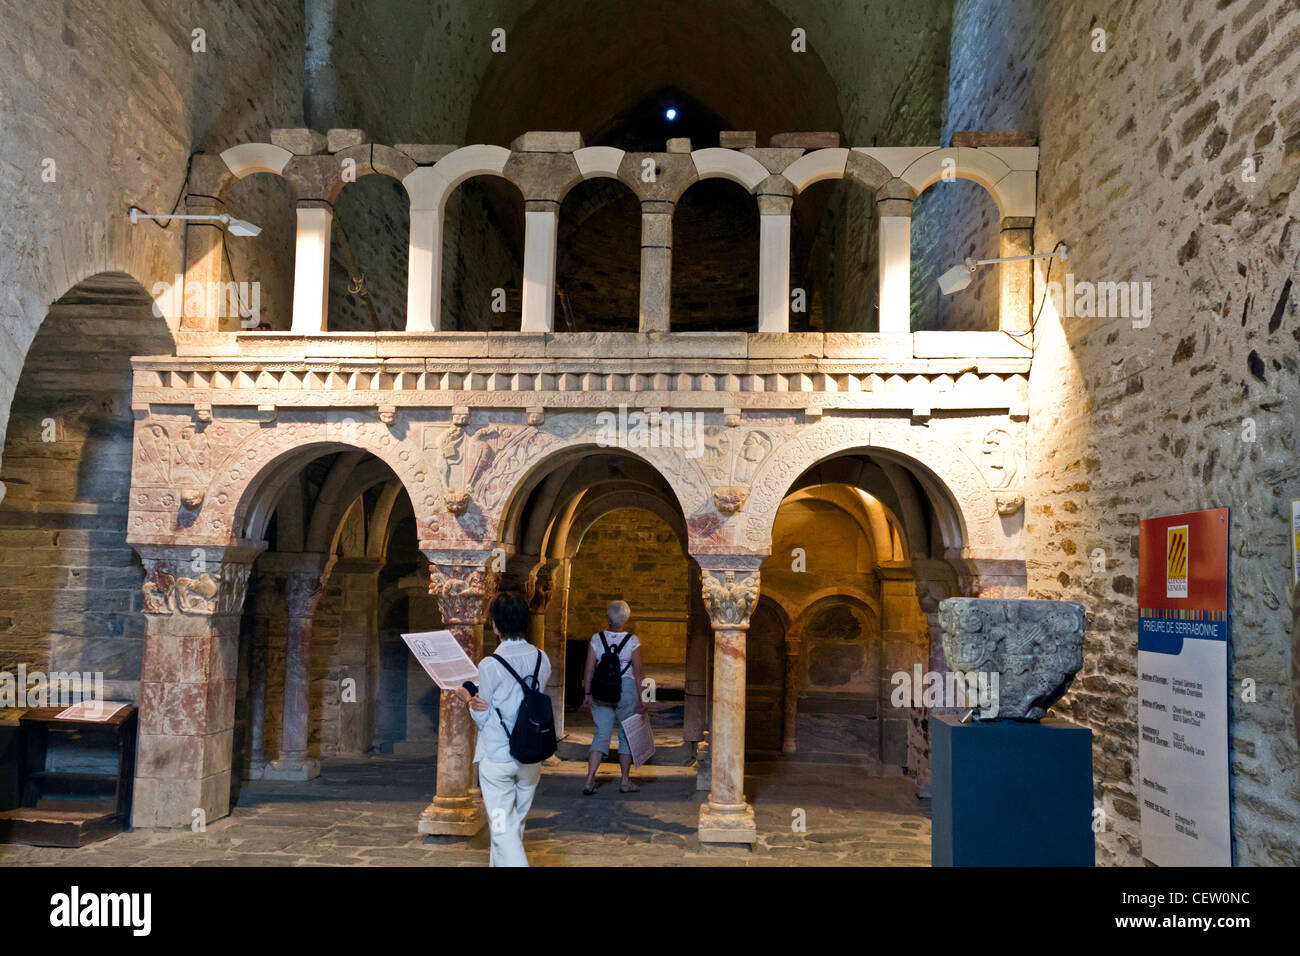 The Rostrum, the  Monastery of Prieurè - Serrabone Priory - Stock Image